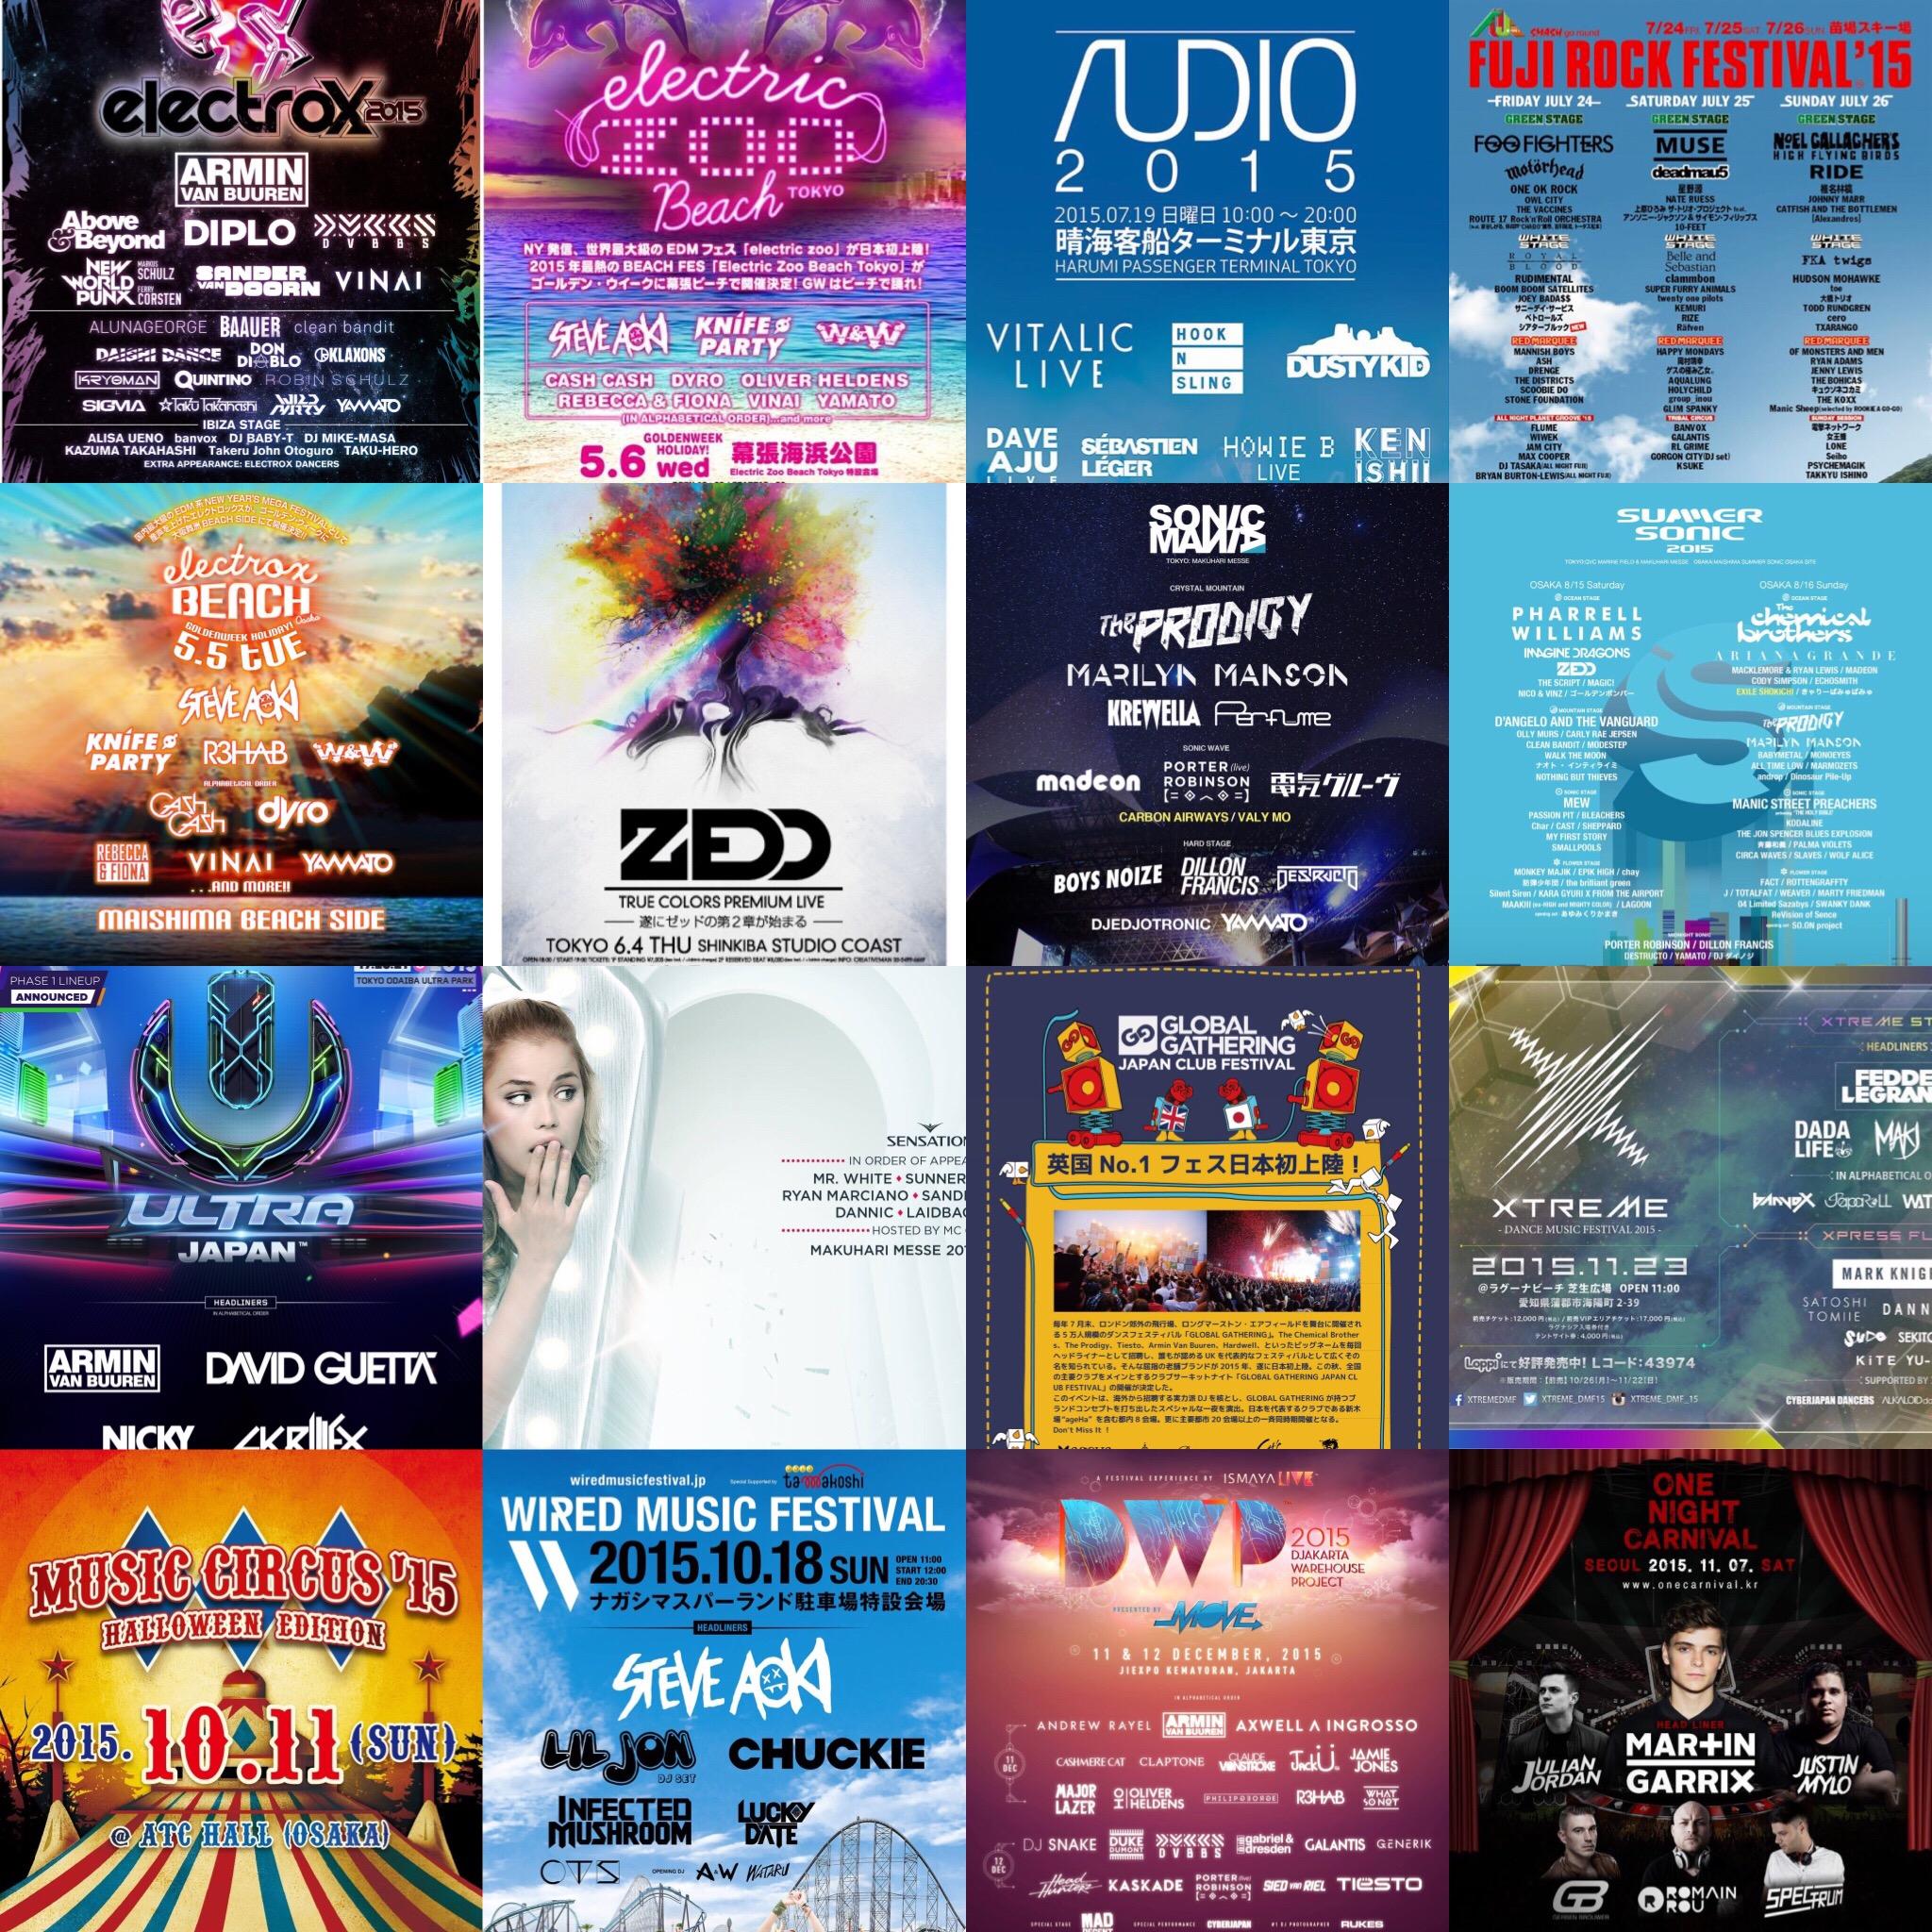 edm-festival-2015